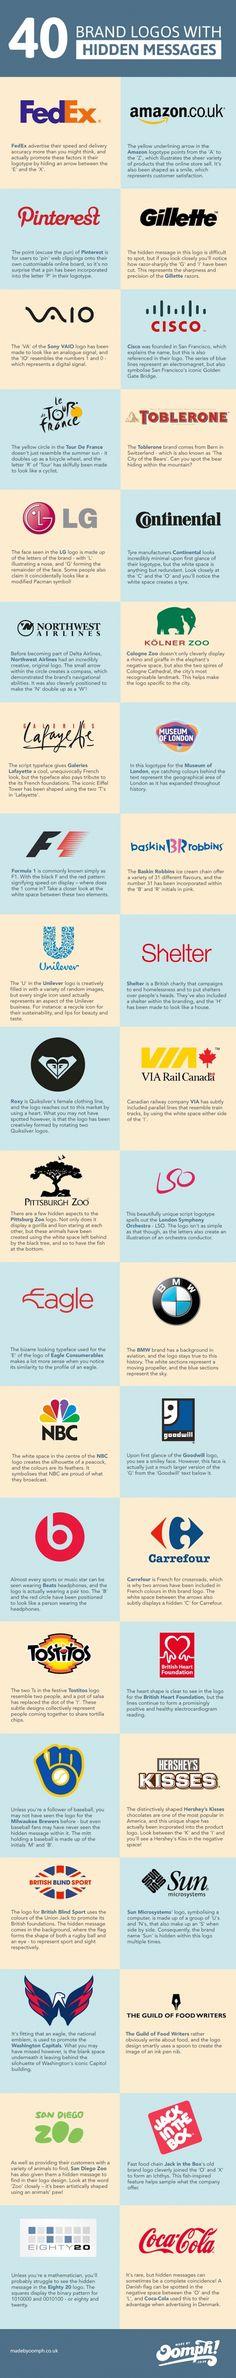 40 Logos With Hidden Messages [Infographic], via @HubSpot